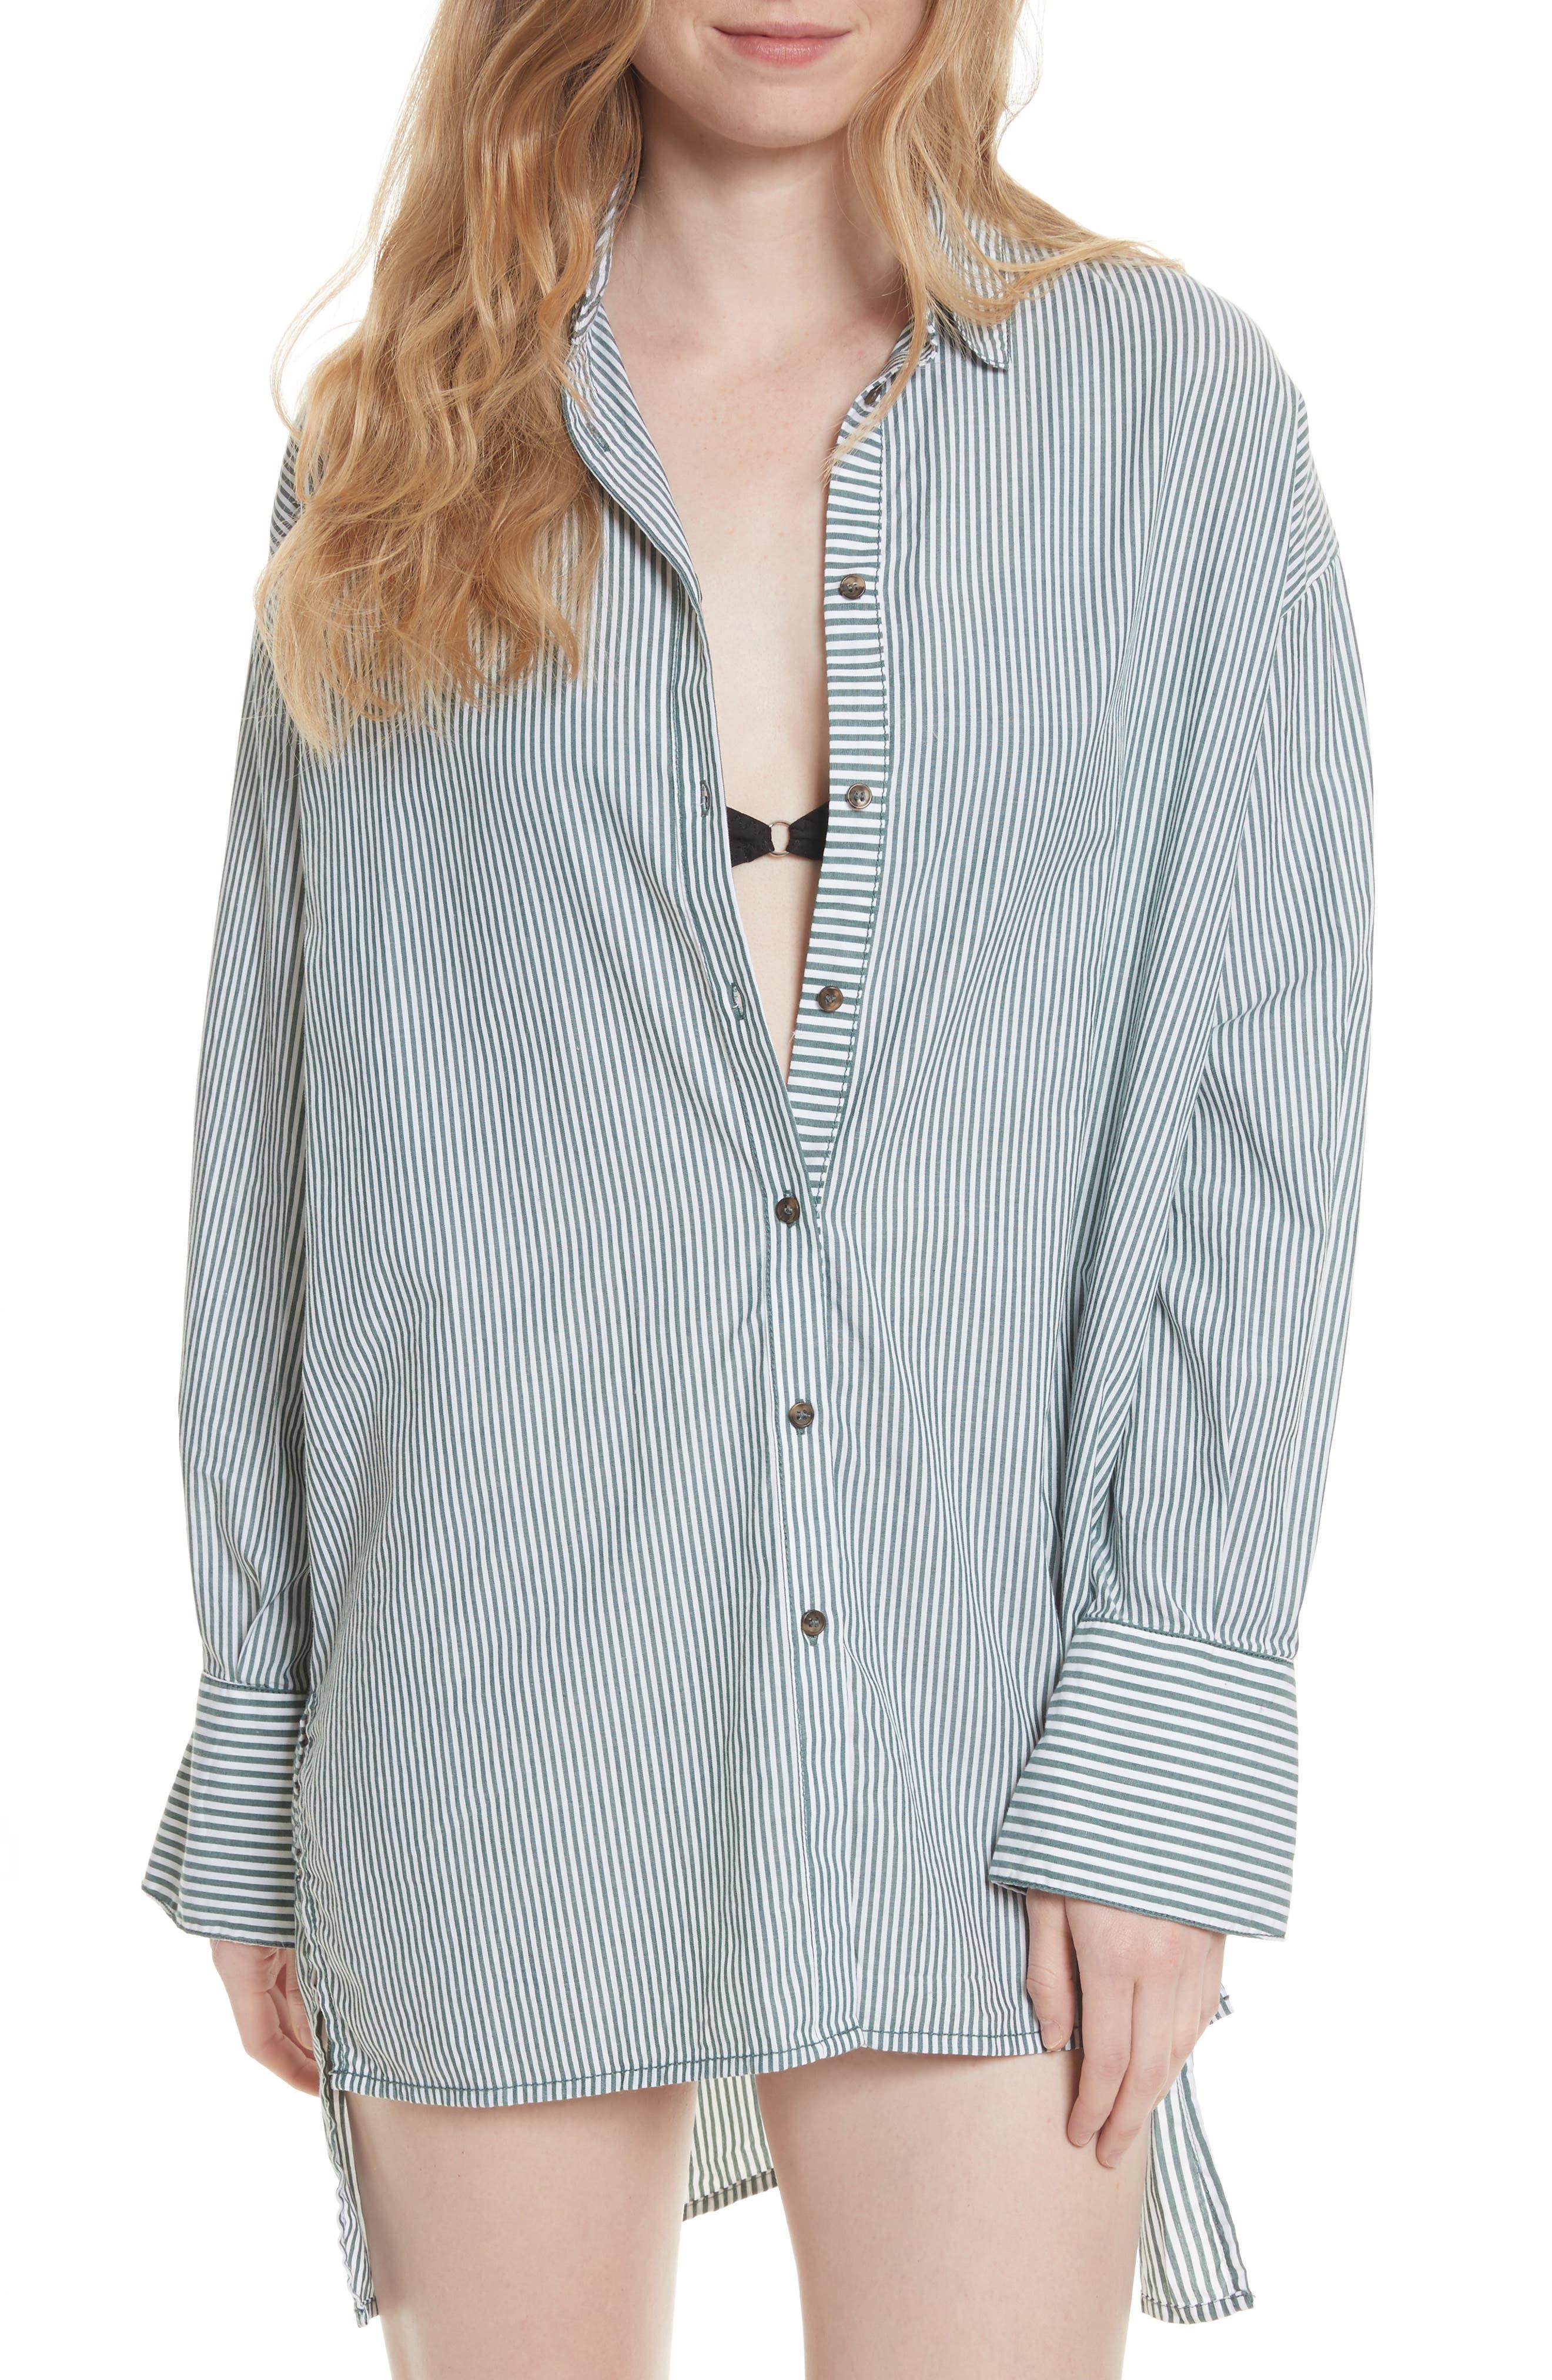 Lakehouse Oversize Shirt,                         Main,                         color, 300